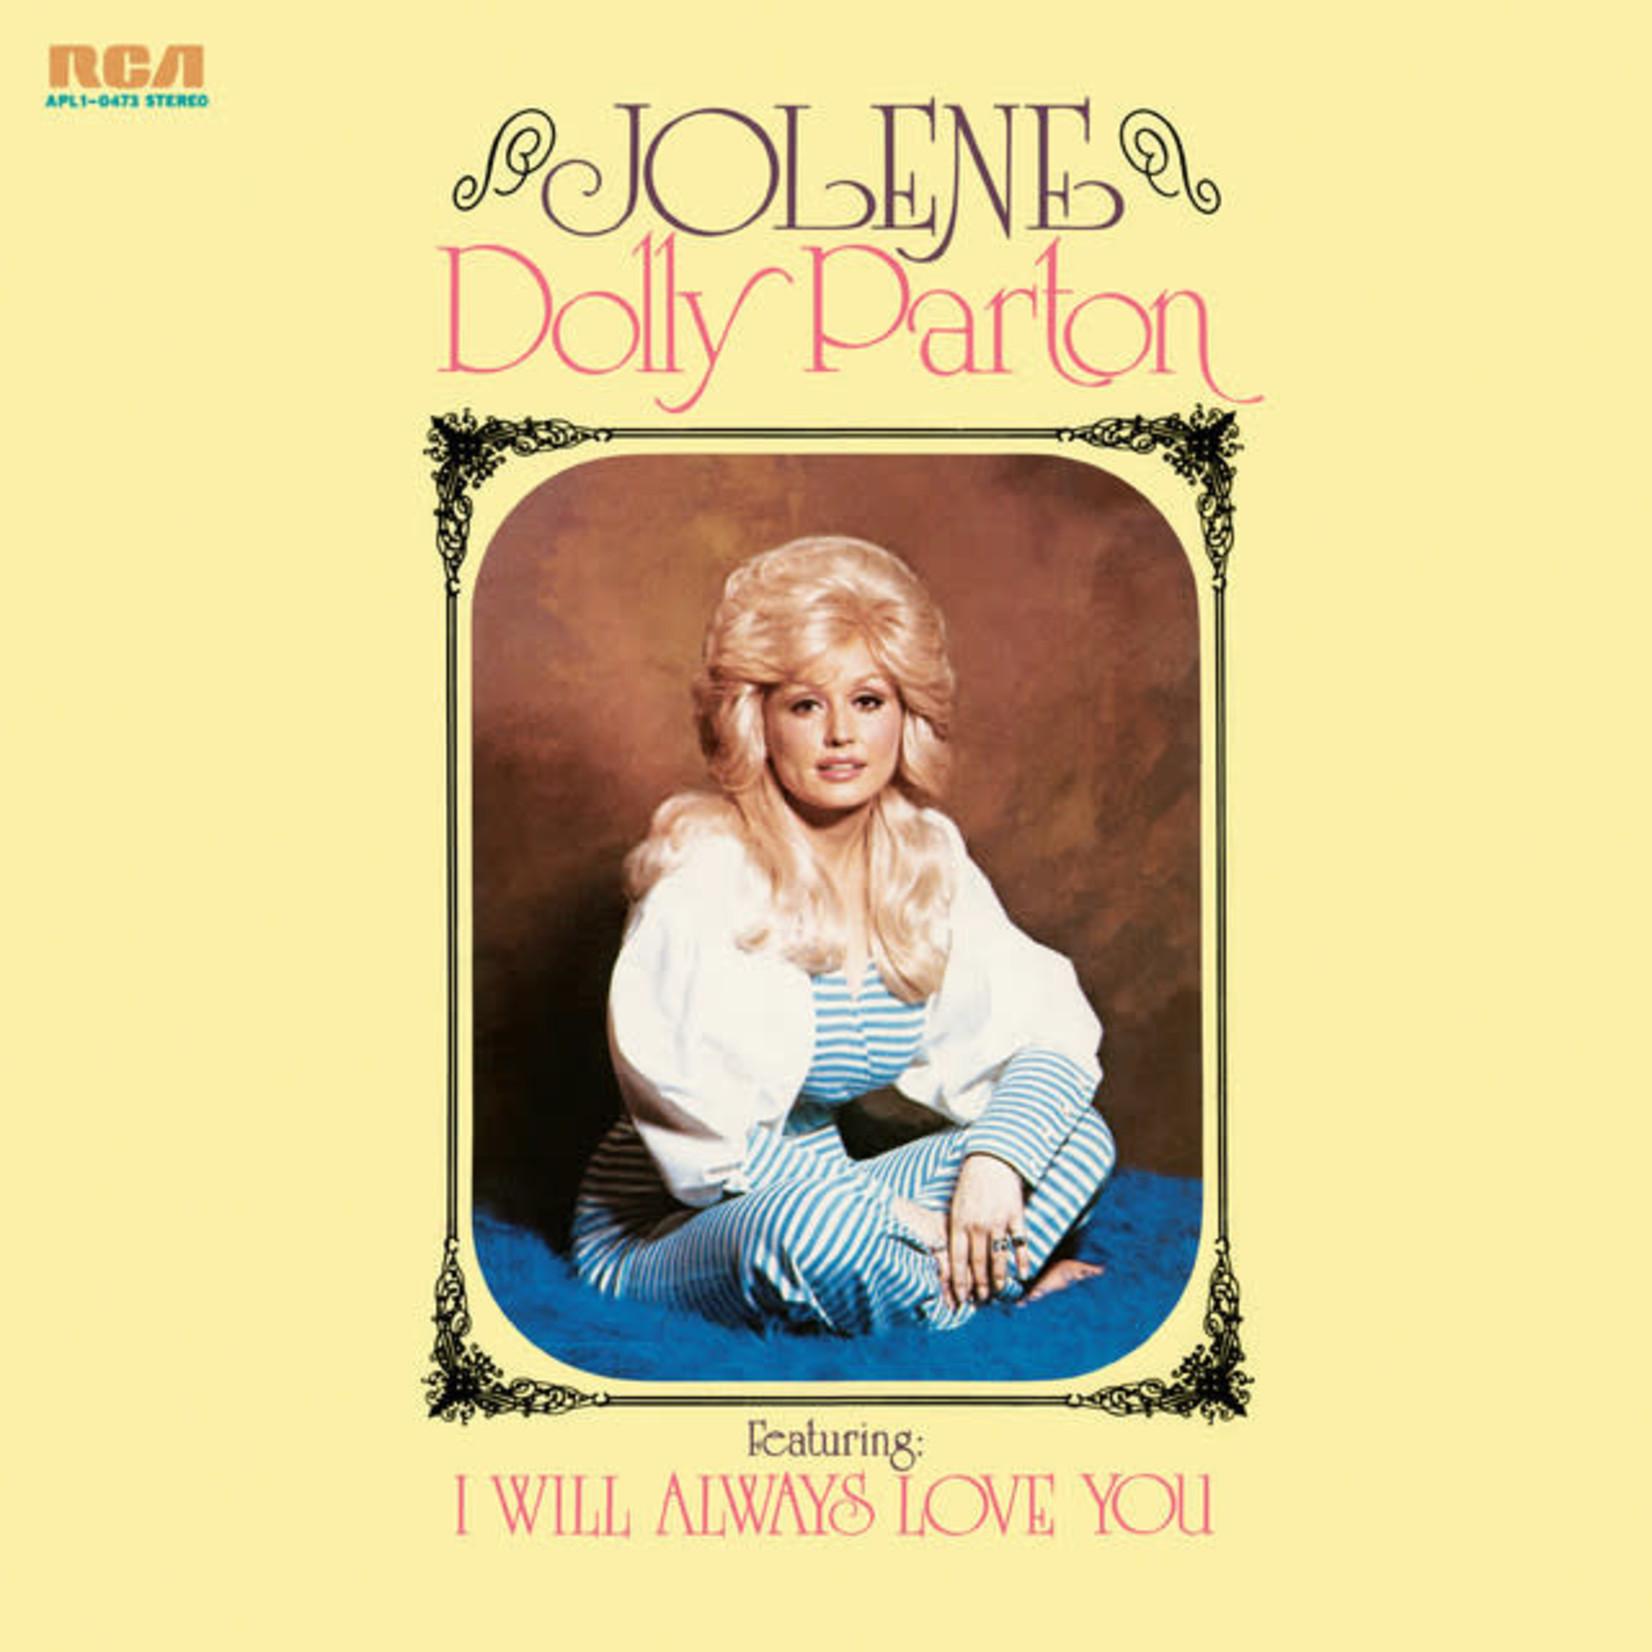 Vinyl Dolly Parton - Jolene